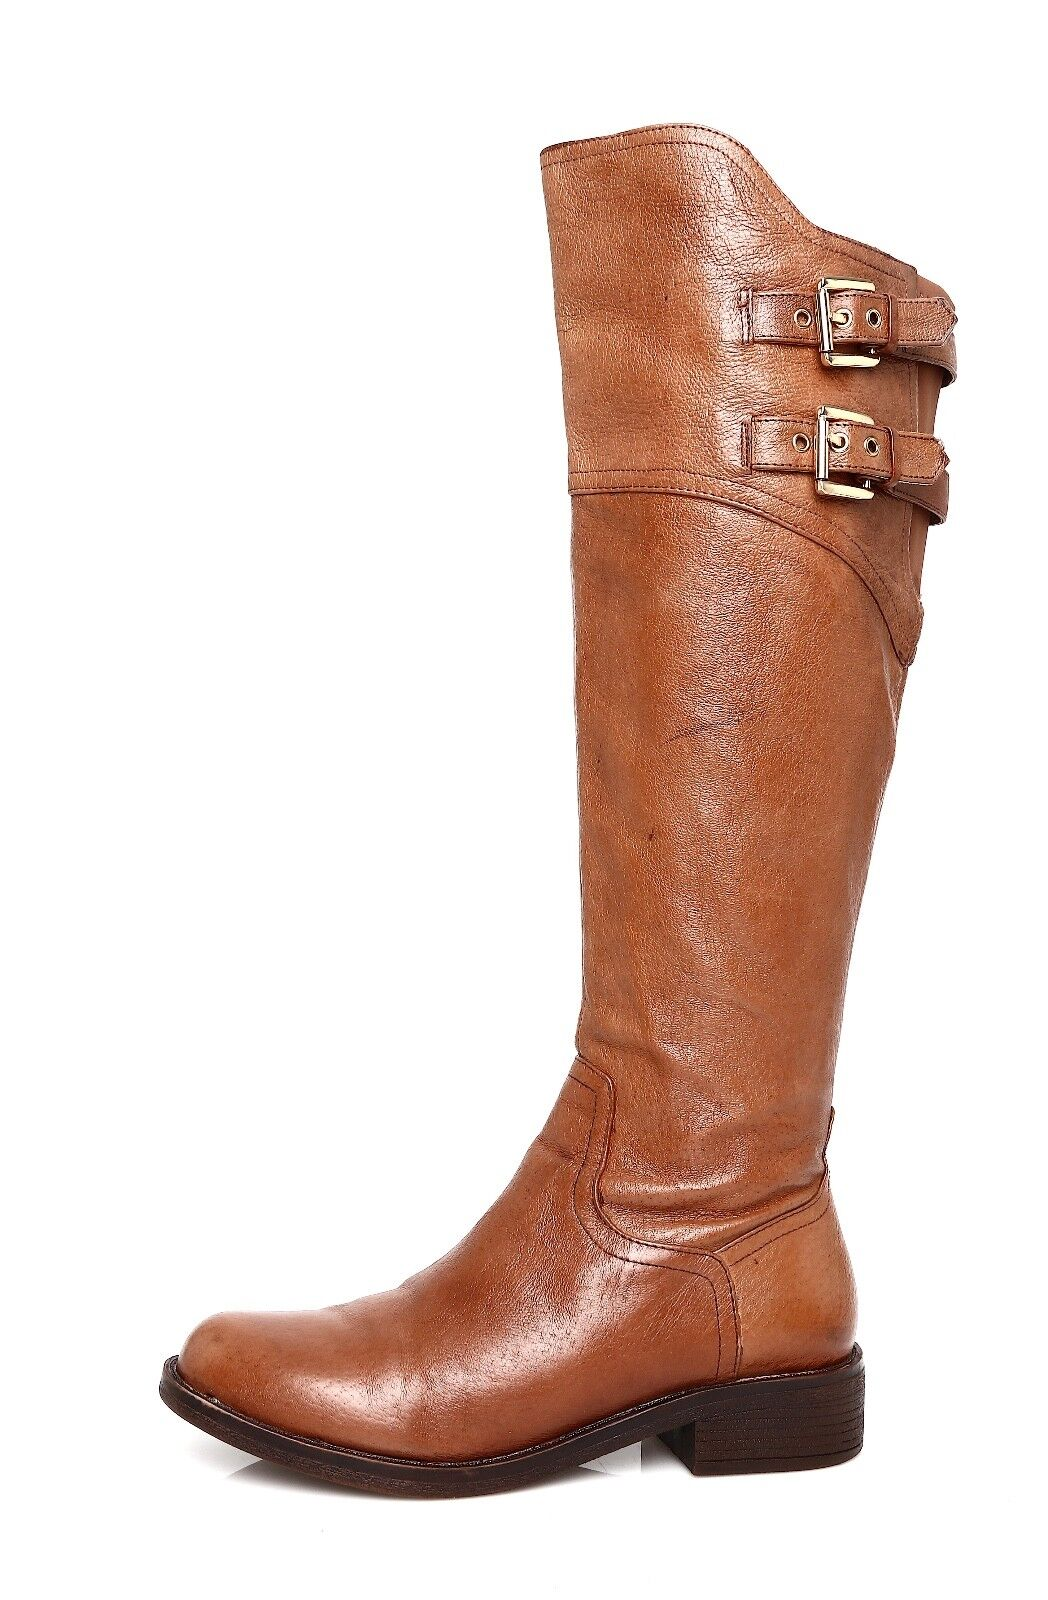 Steve Madden Ogreen Women's Leather Brown Boot Sz 6 M 4455